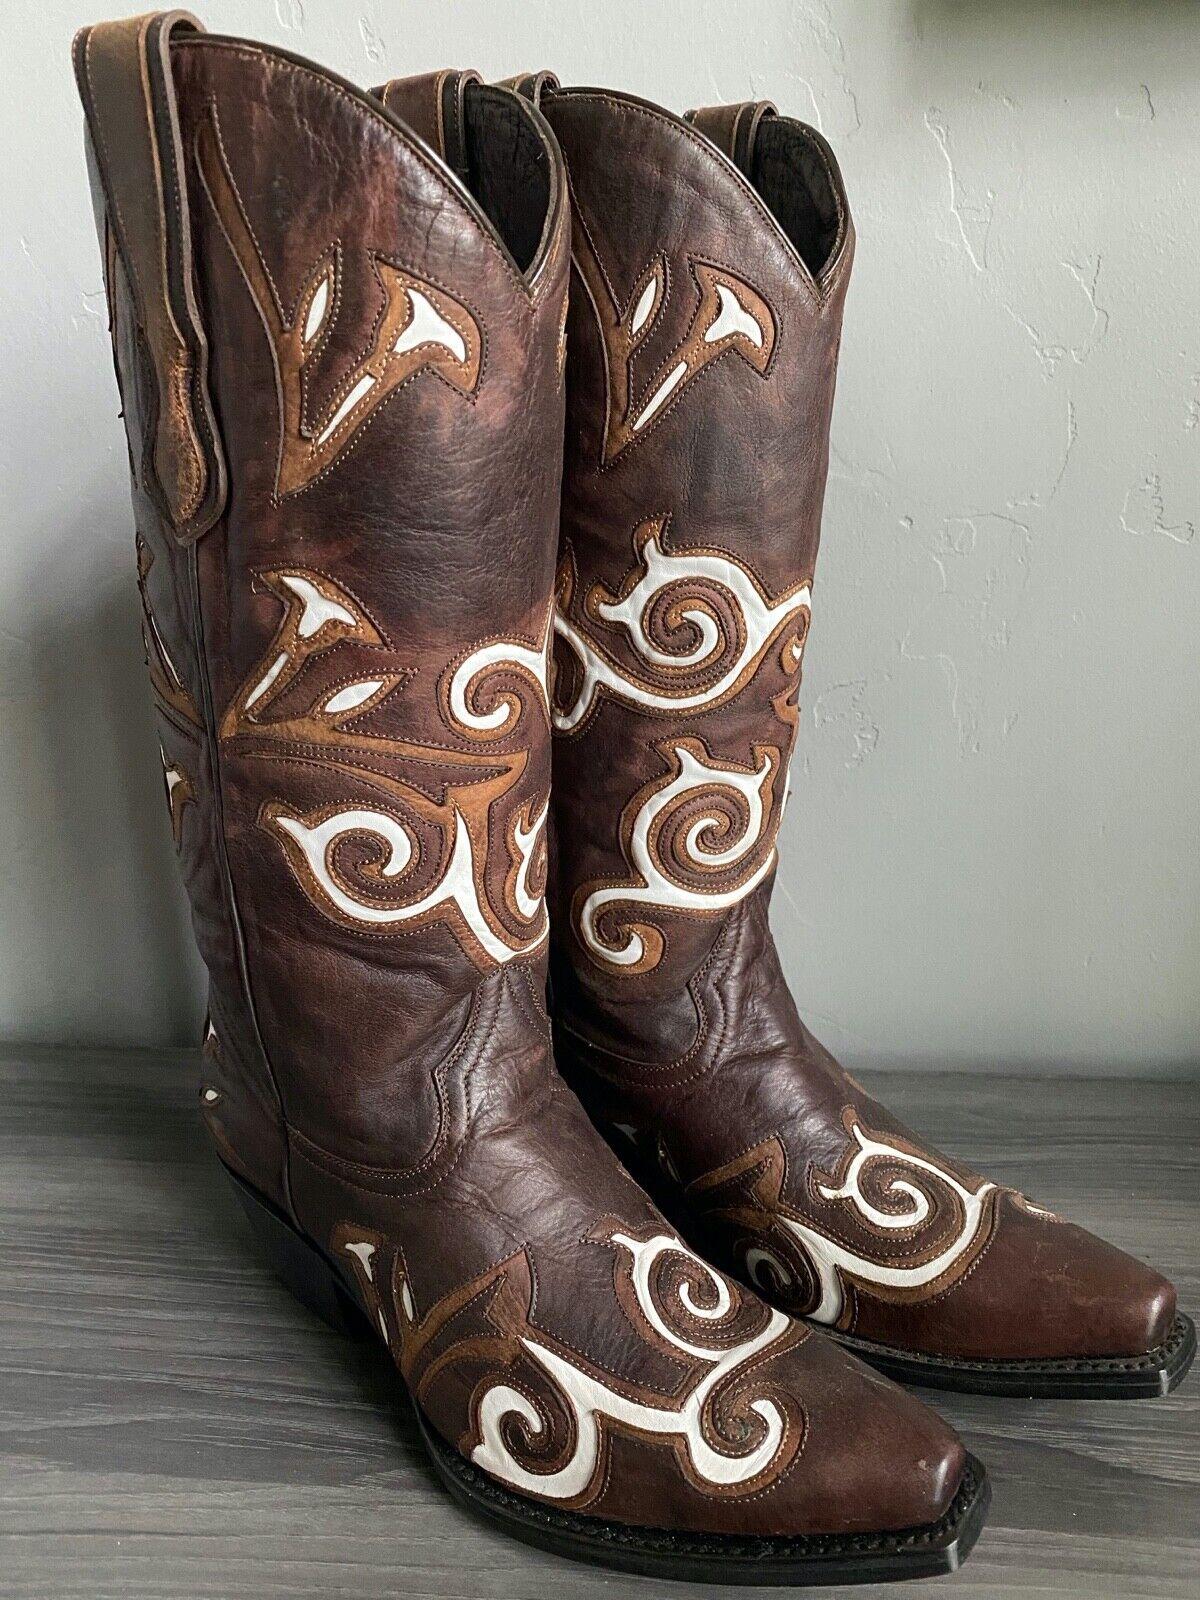 New DARK BROWN & WHITE inlay womens ladies cowboy boots - sample sale! Size 7